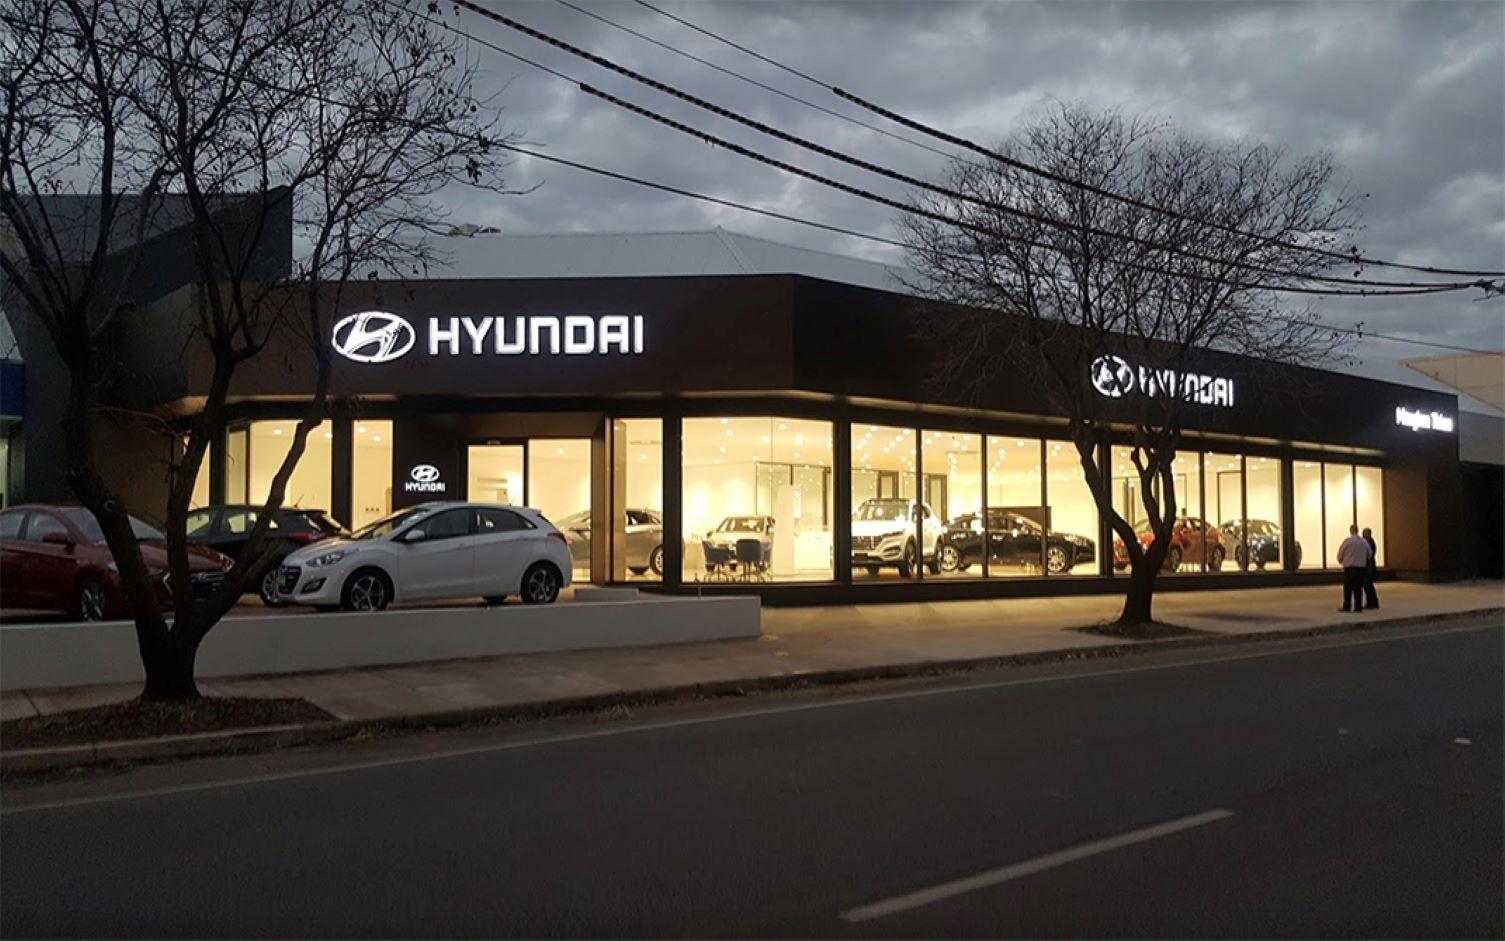 https://ggtiling.com.au/wp-content/uploads/2019/08/G-G-Tiling-Commercial-Maugham-Thiem-Hyundai_6.jpg